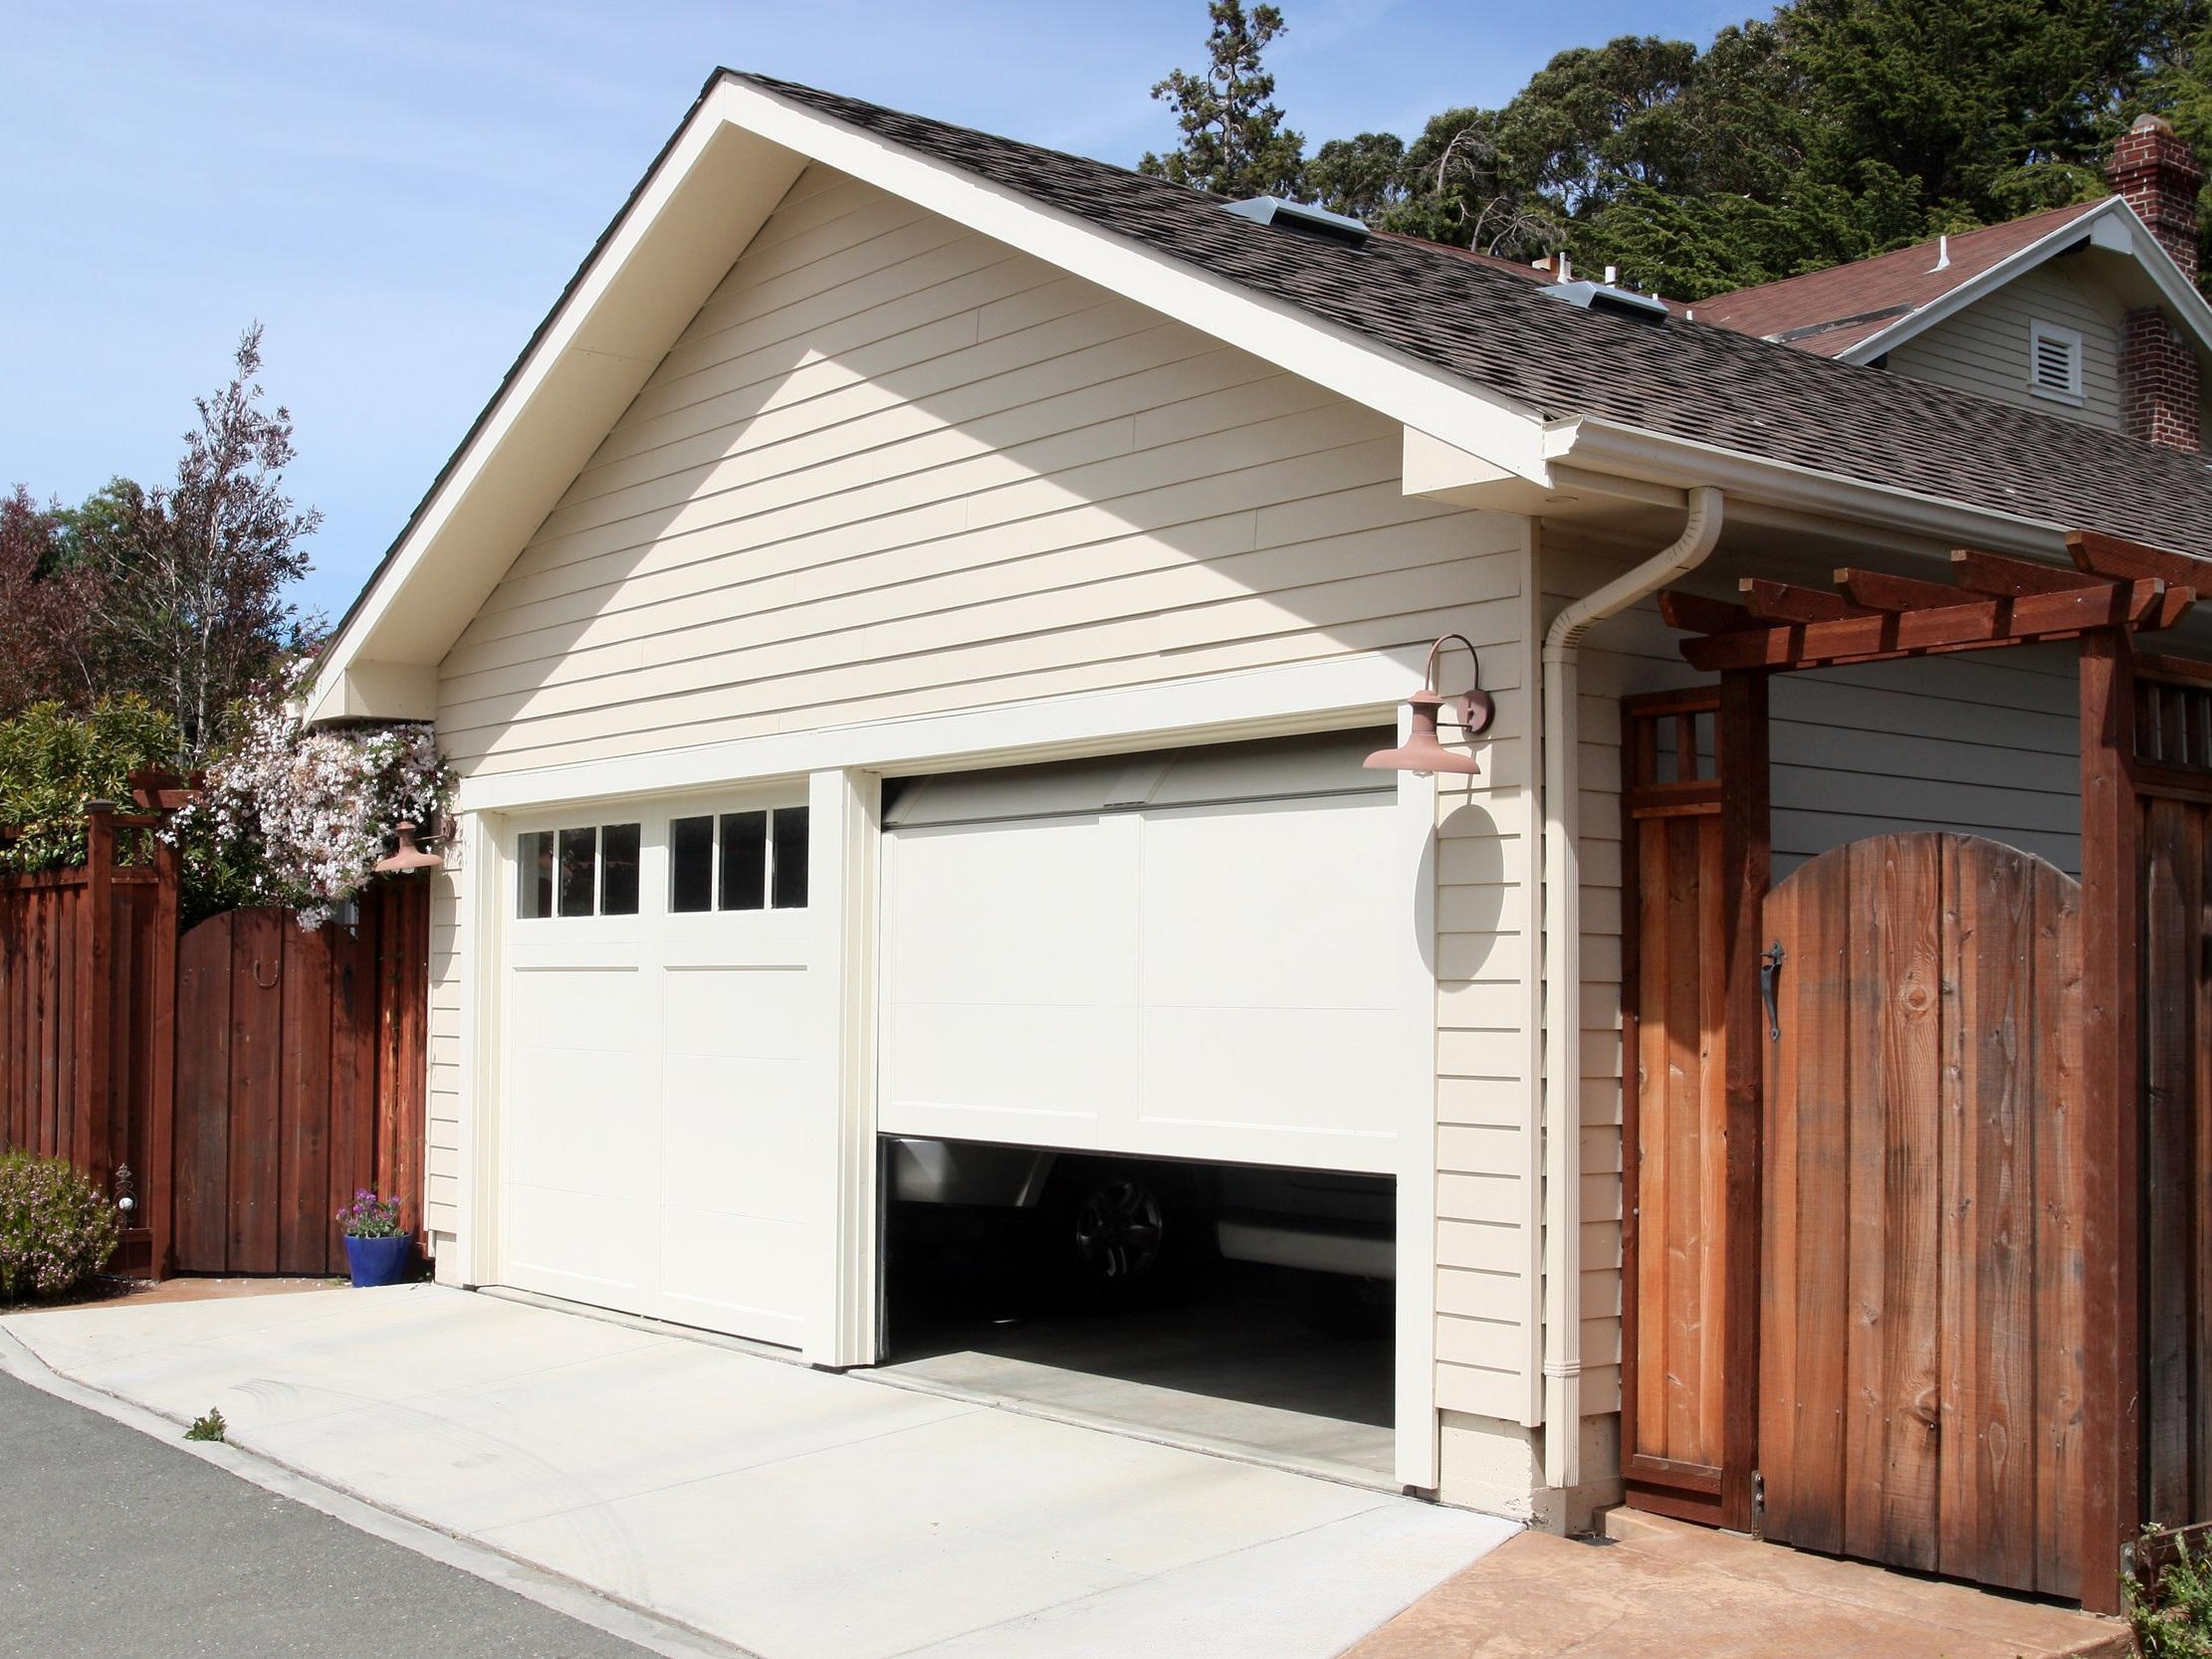 Garage Door Repair Fulton ny